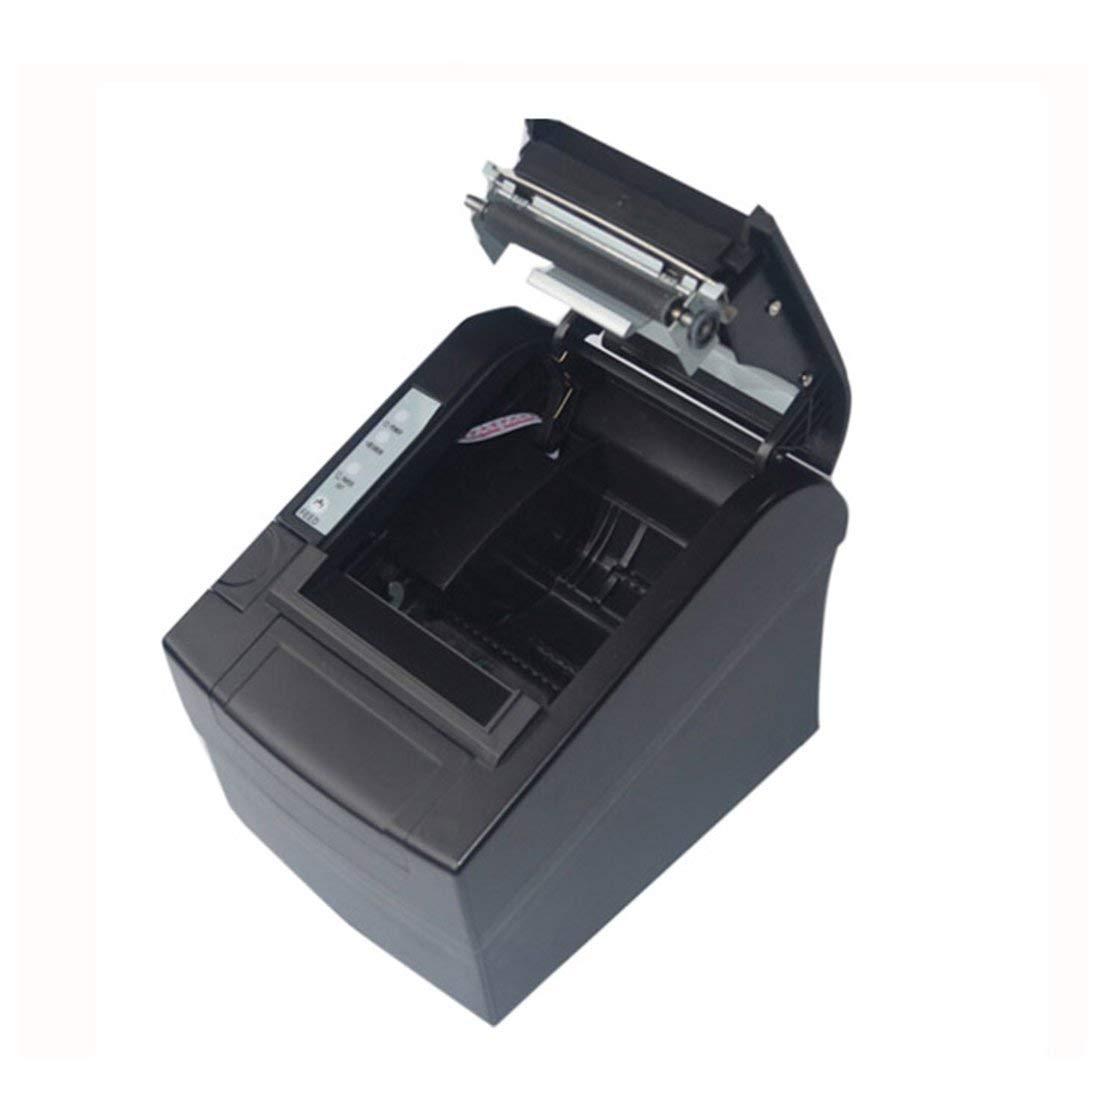 POS-8220 Impresora de Recibos térmica de POS inalámbrico de WiFi ...